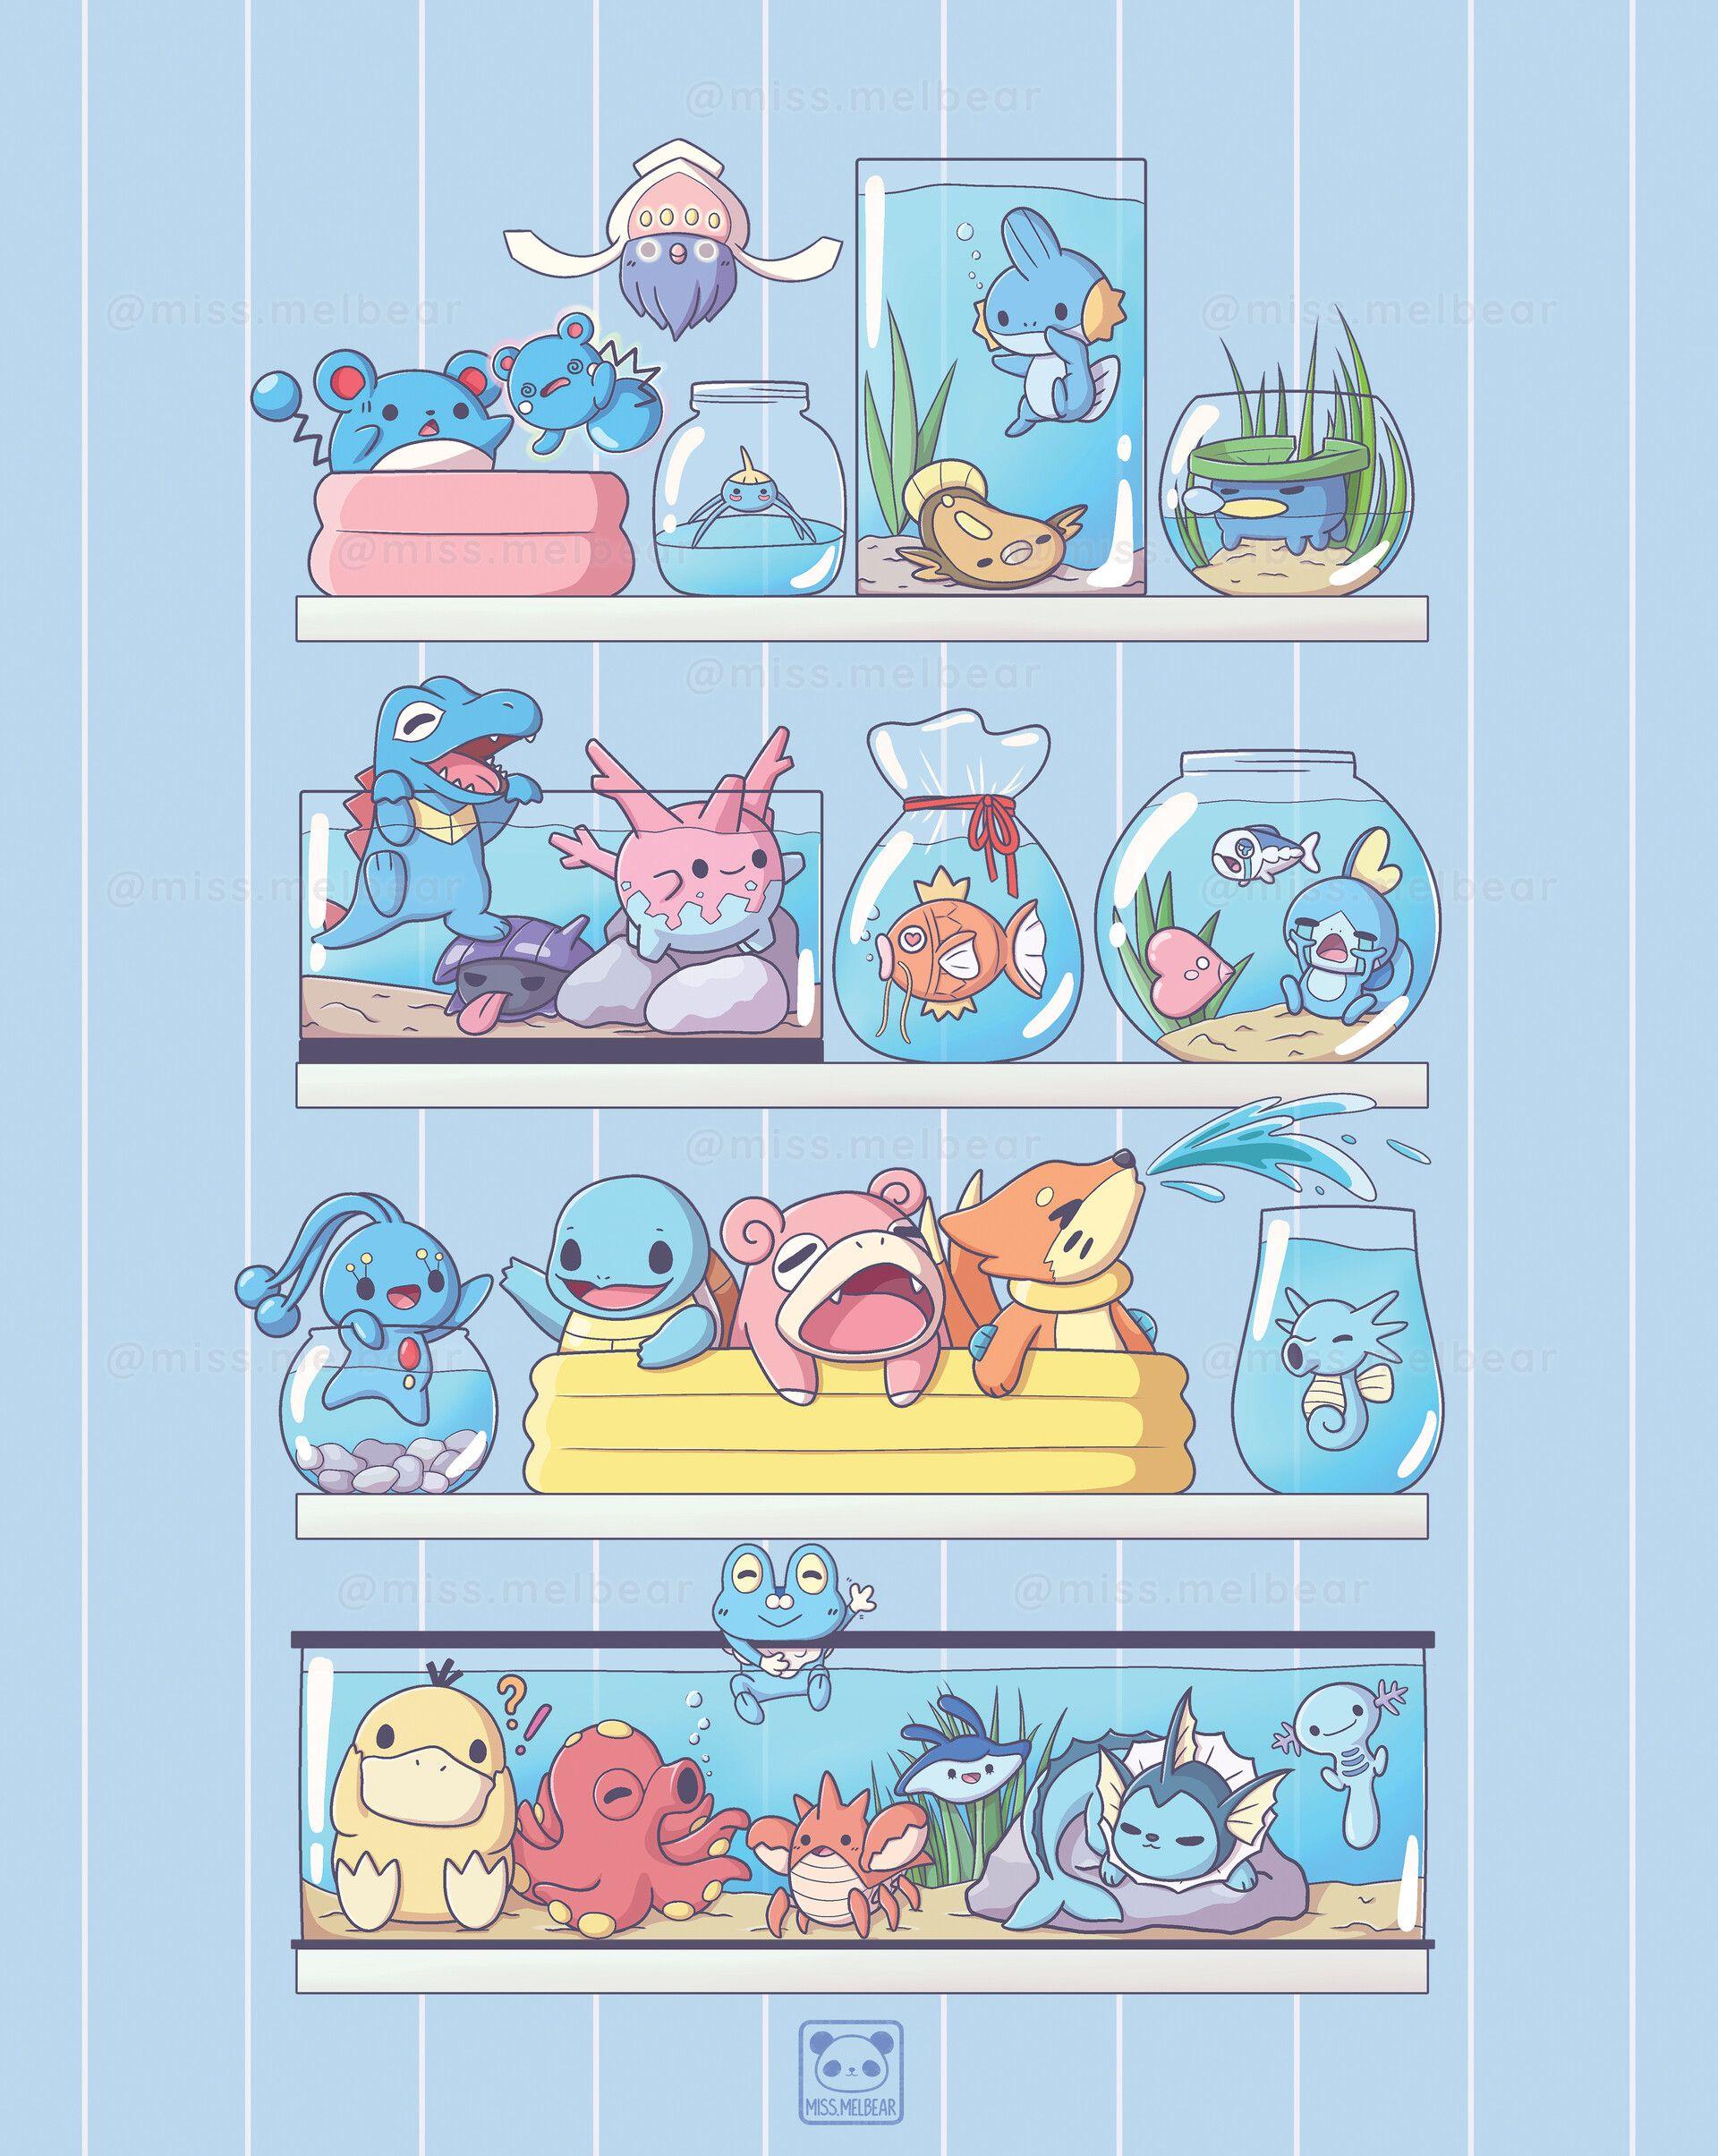 Aesthetic Pokemon Water Edition Cute Pokemon Pictures Pokemon Pokemon Poster